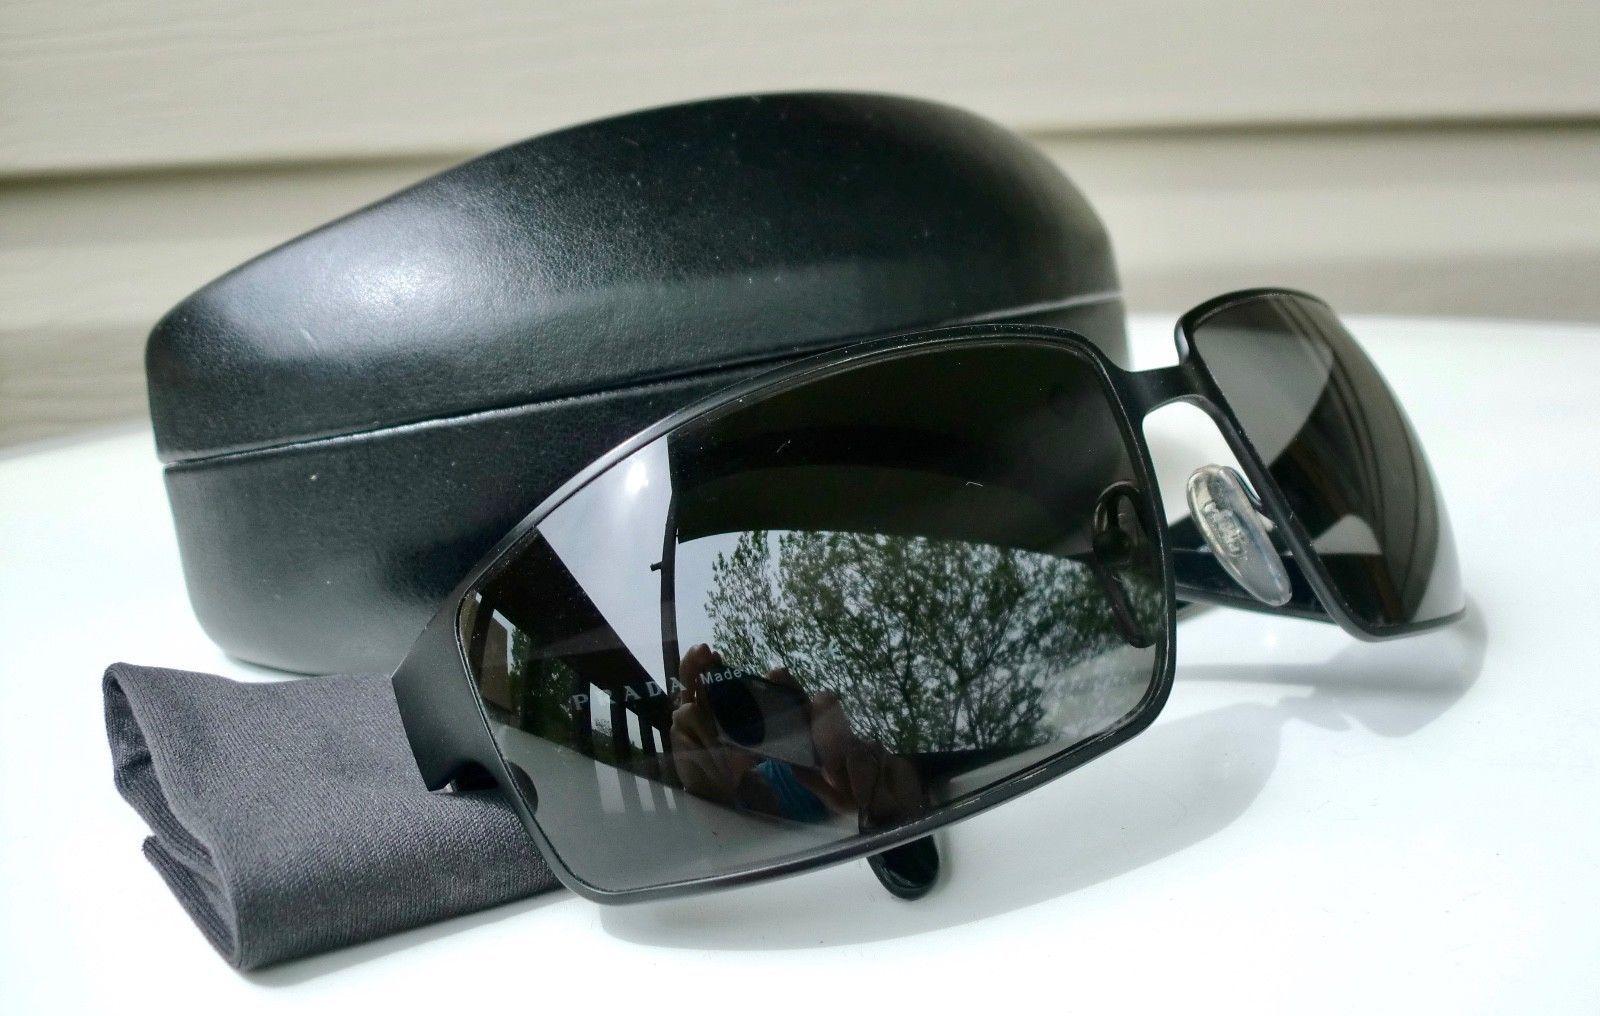 0980f084d0302 PRADA Designer BIKER Sunglasses Rectangle BLACK-Metal Frame  Round-Temple-Corners (eBay